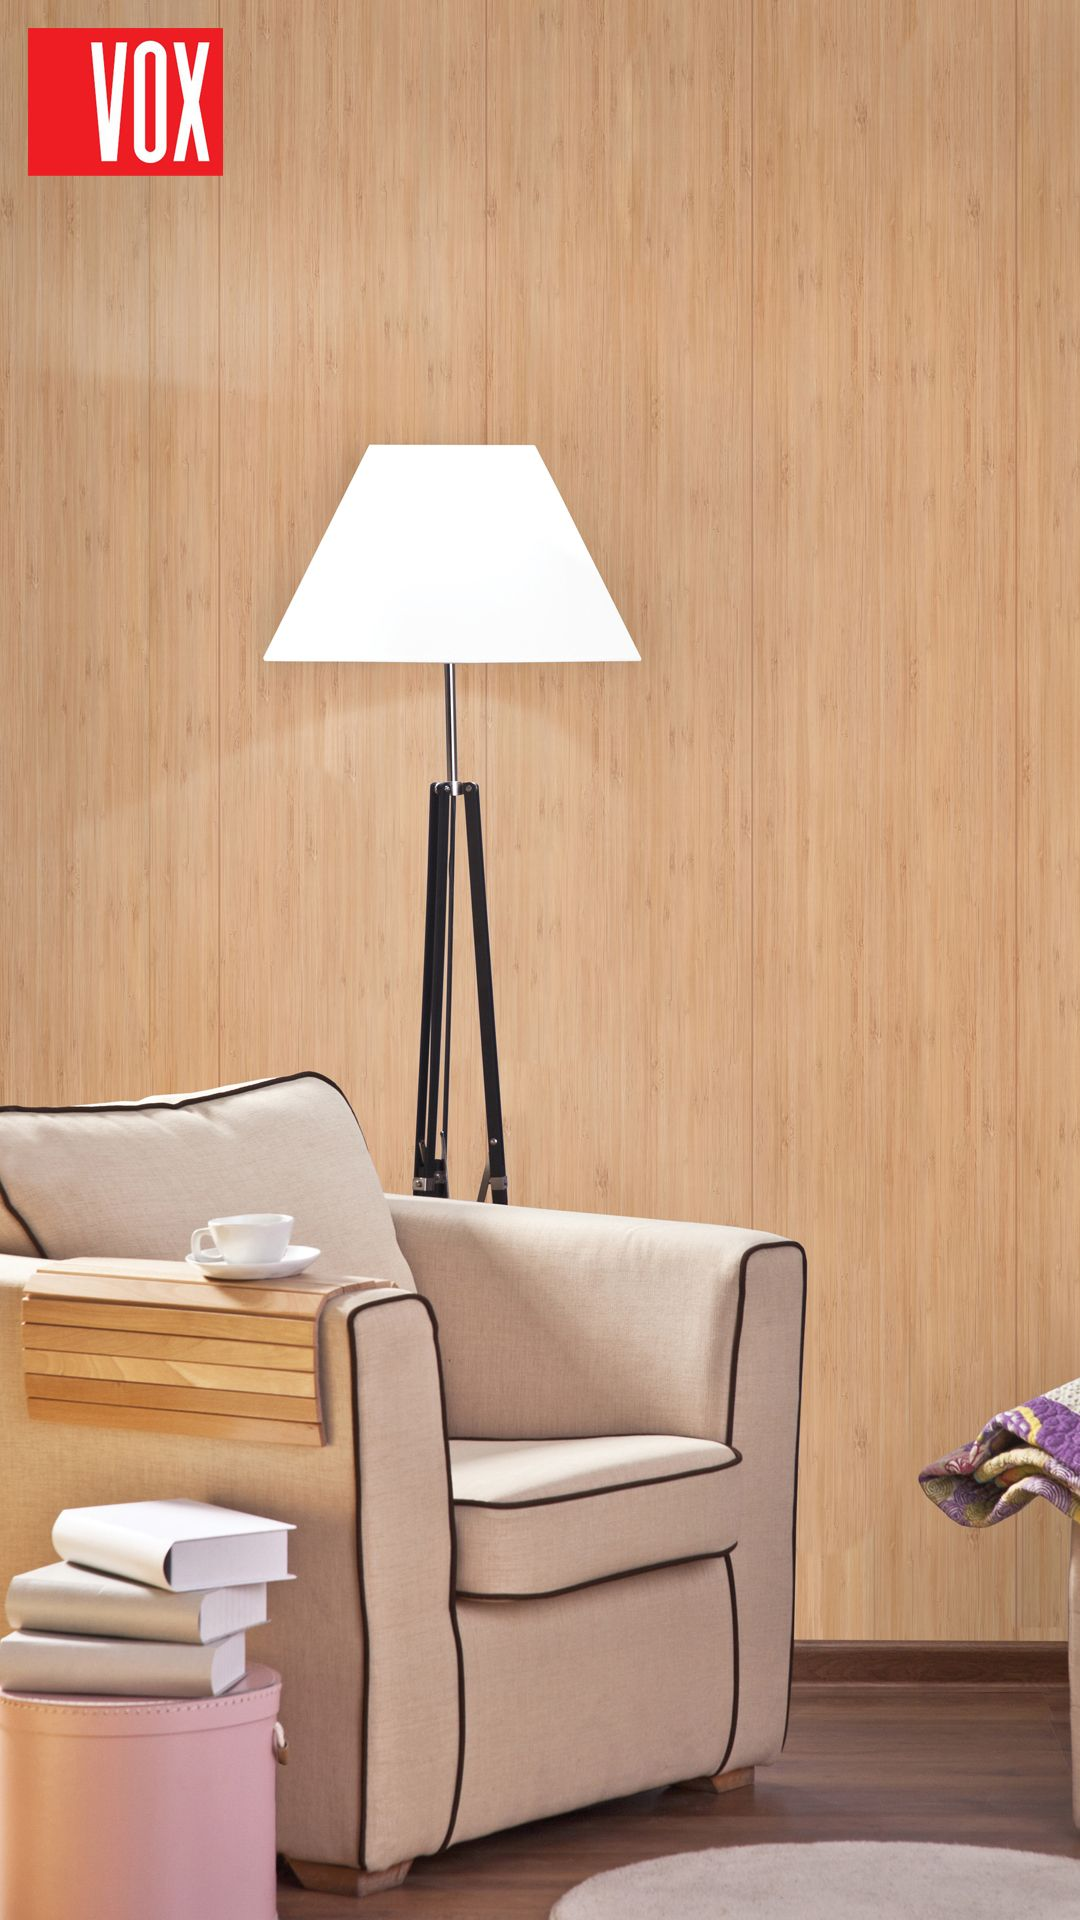 Profile Vox Bamboo Natural Panele Dekoracyjne Decorative